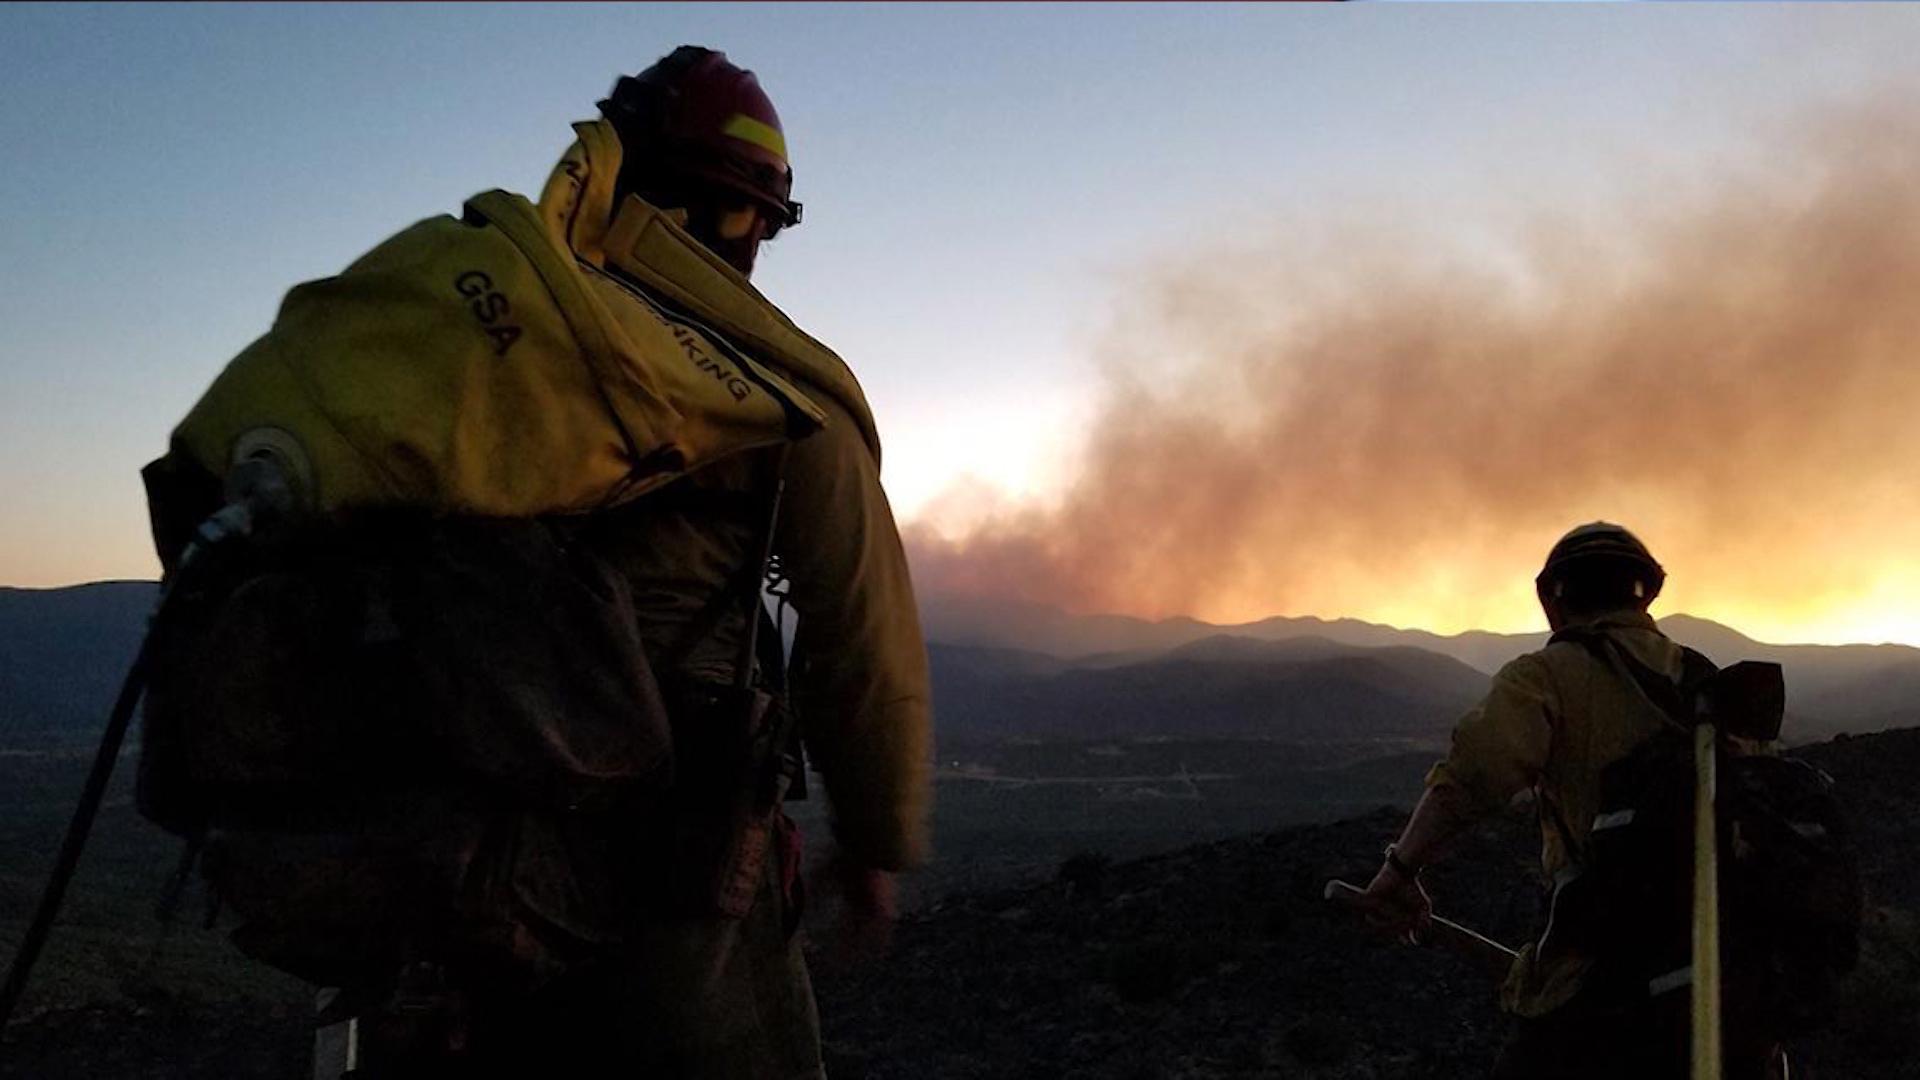 Wildland firefighters watch smoke from a wildfire.